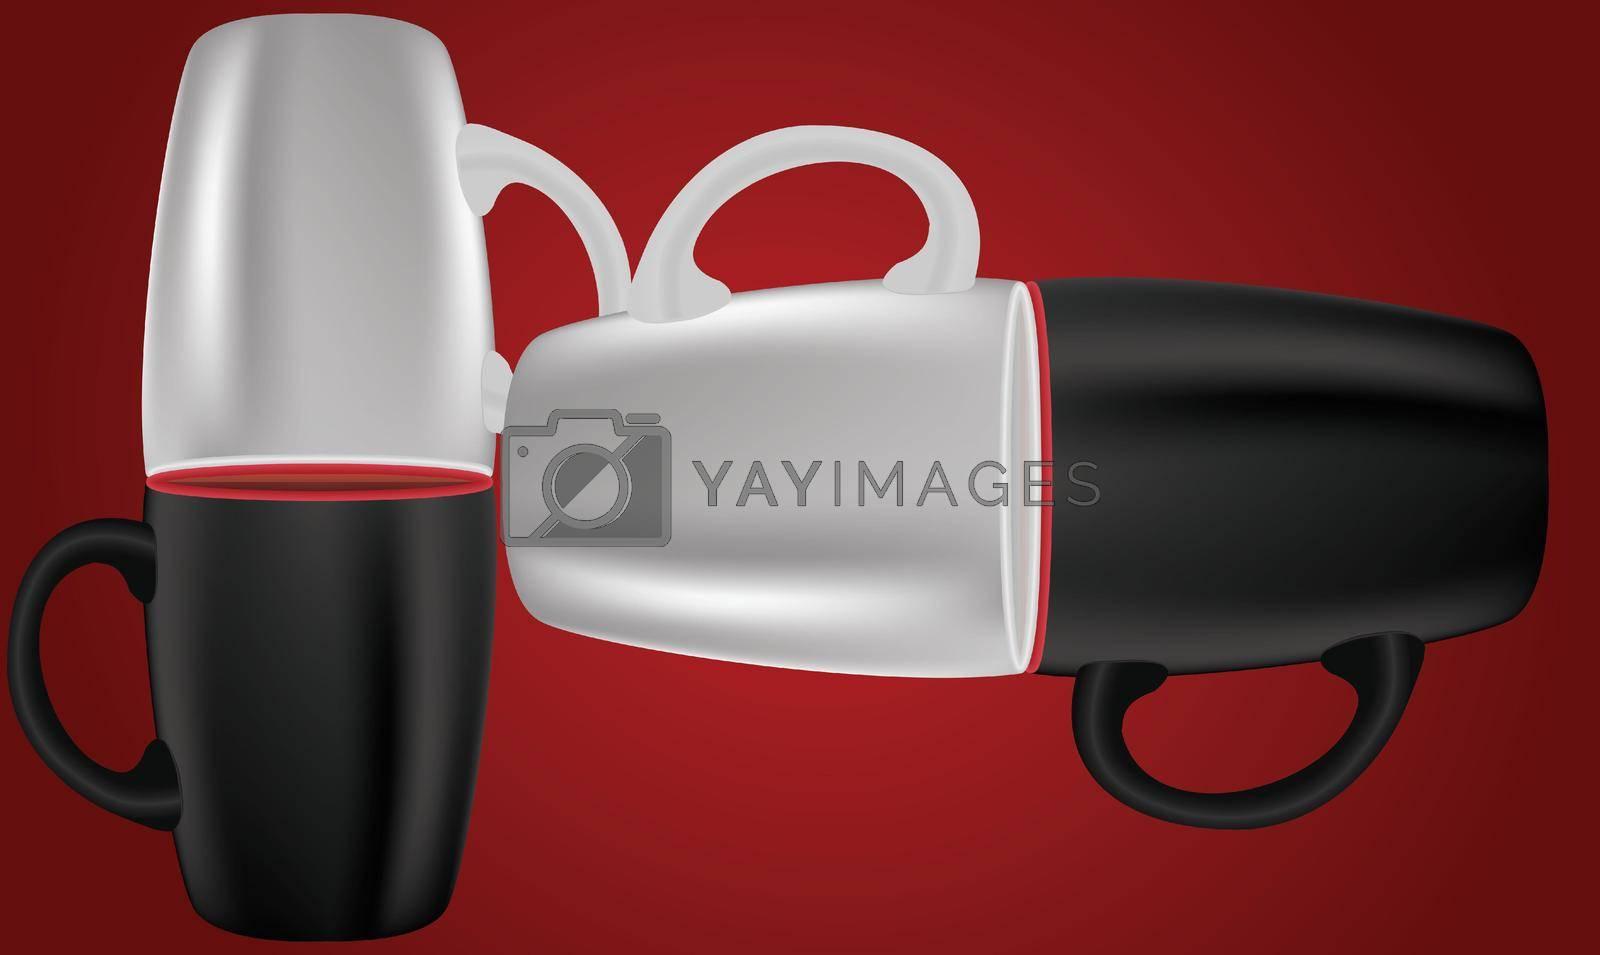 Royalty free image of Mockup illustration of coffee mug on abstract dark background by aanavcreationsplus